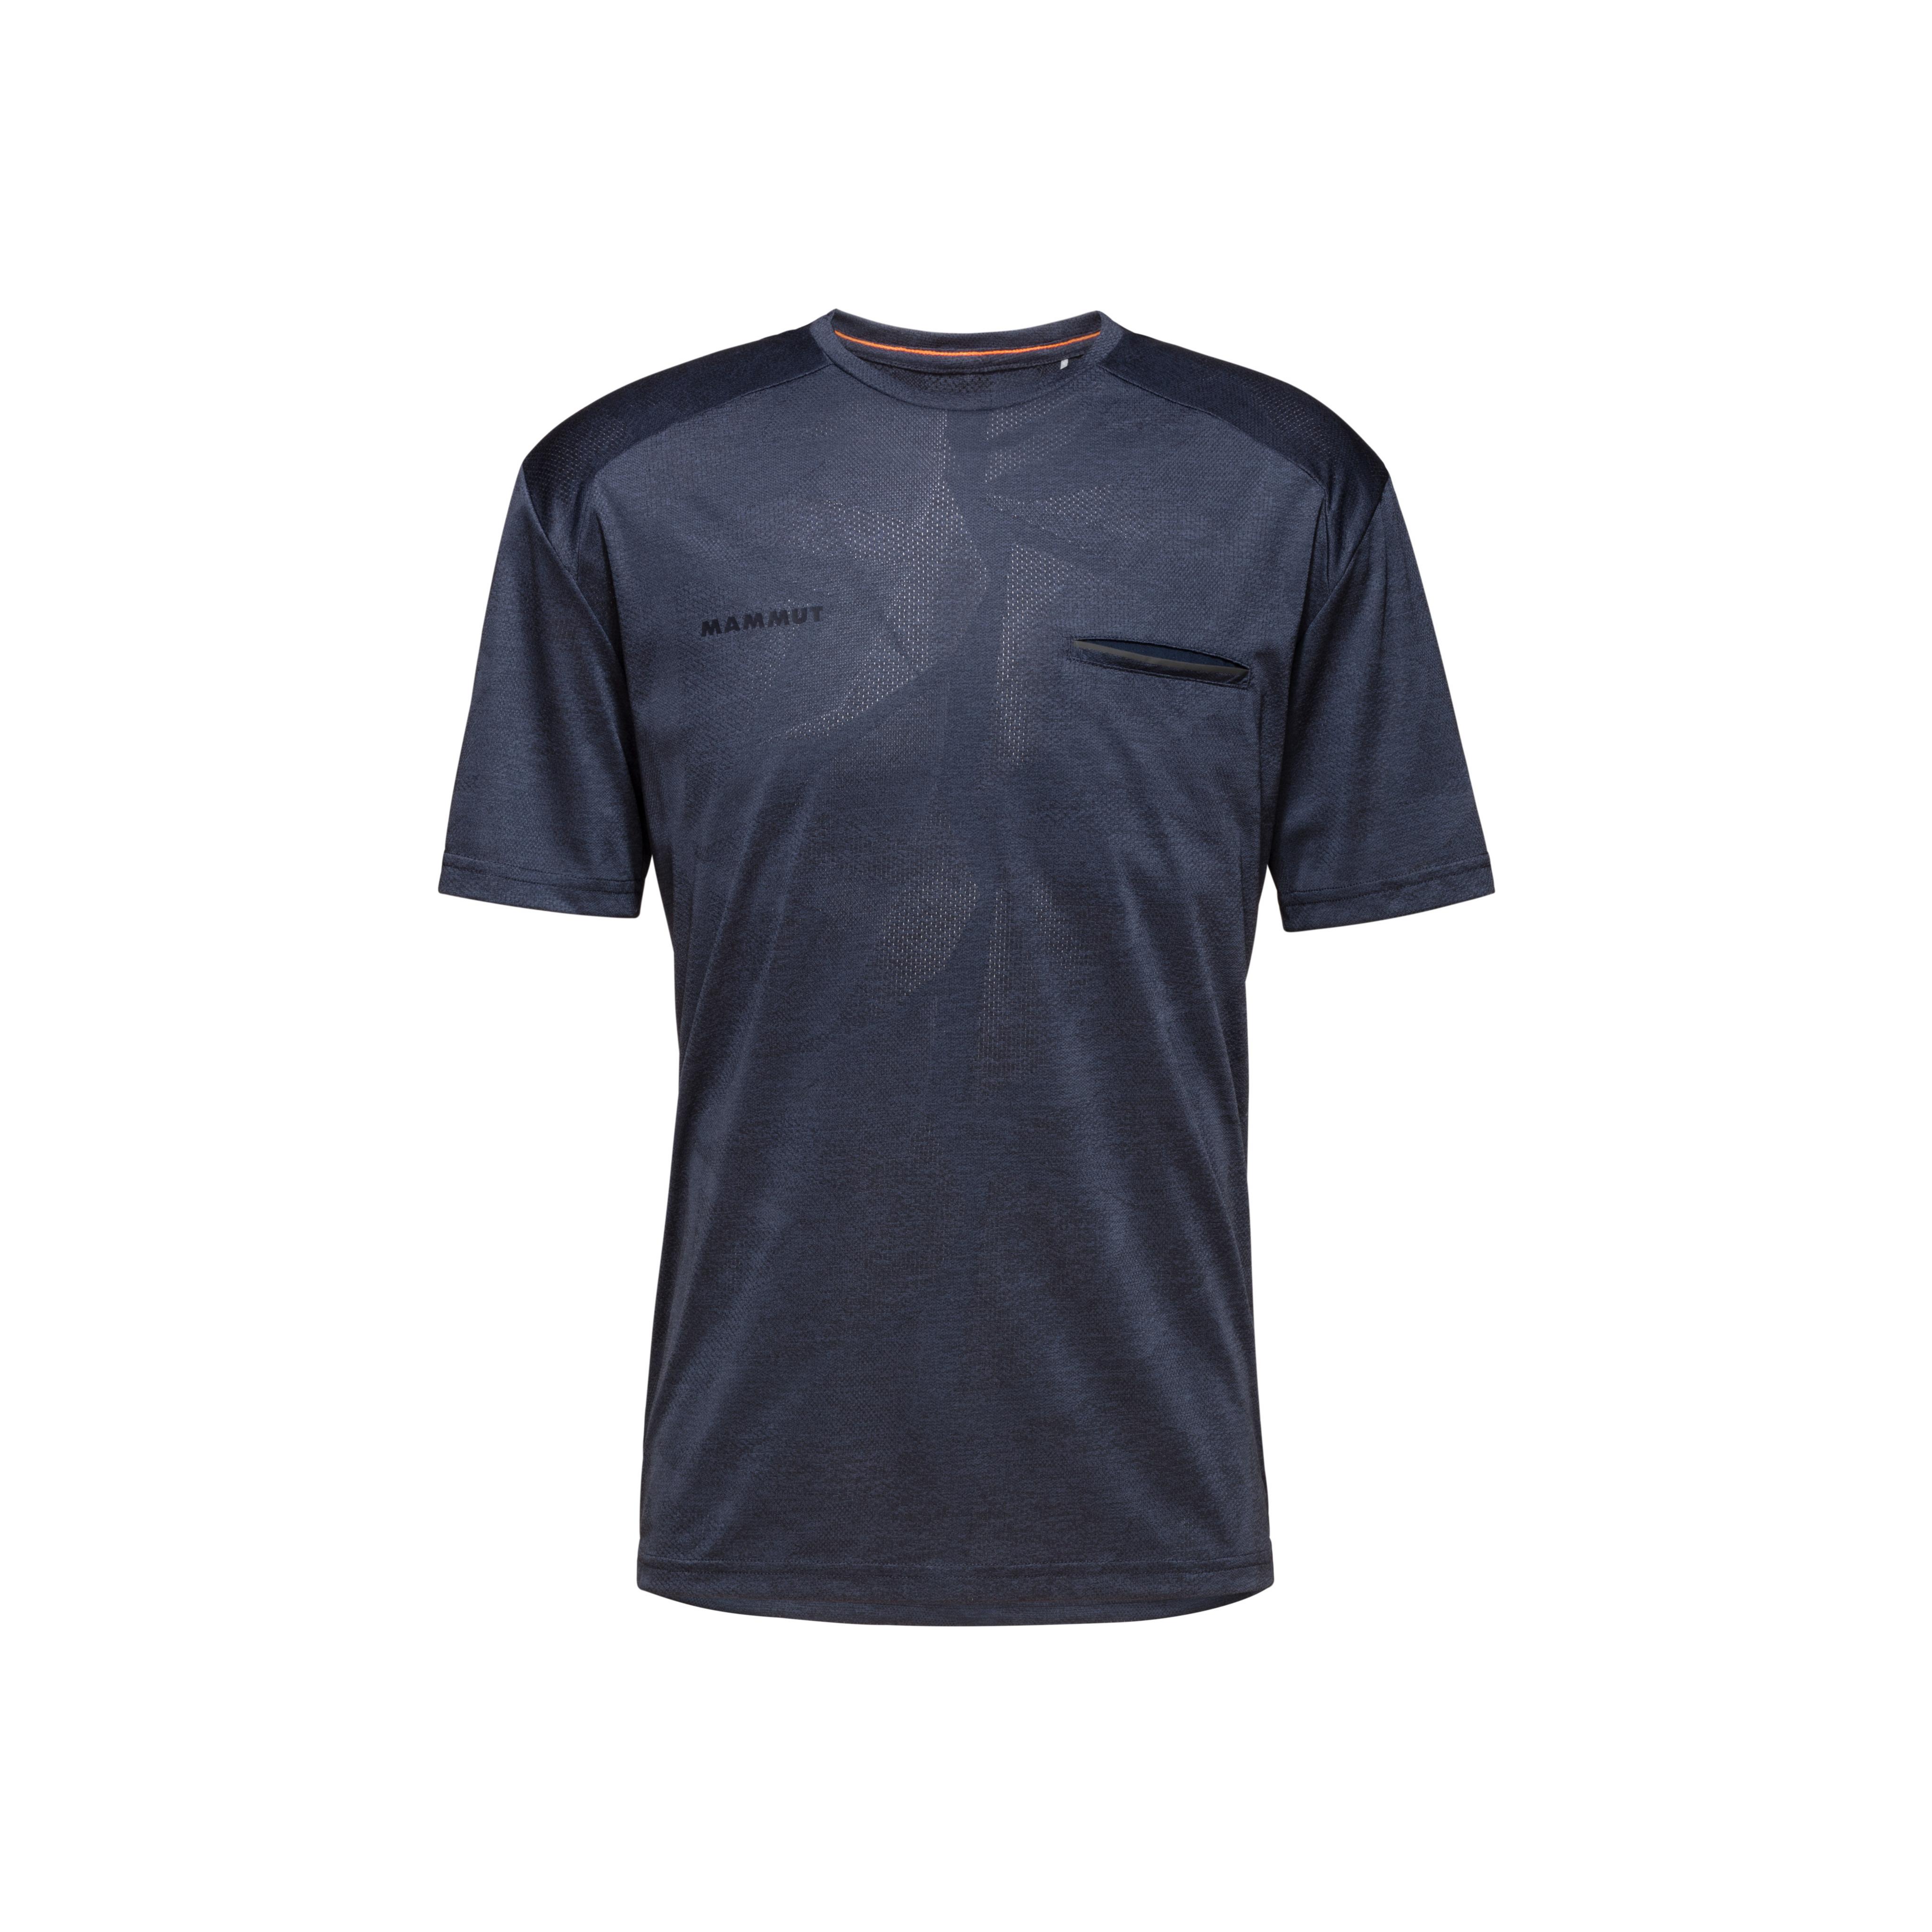 Crashiano T-Shirt Men - marine melange, S thumbnail